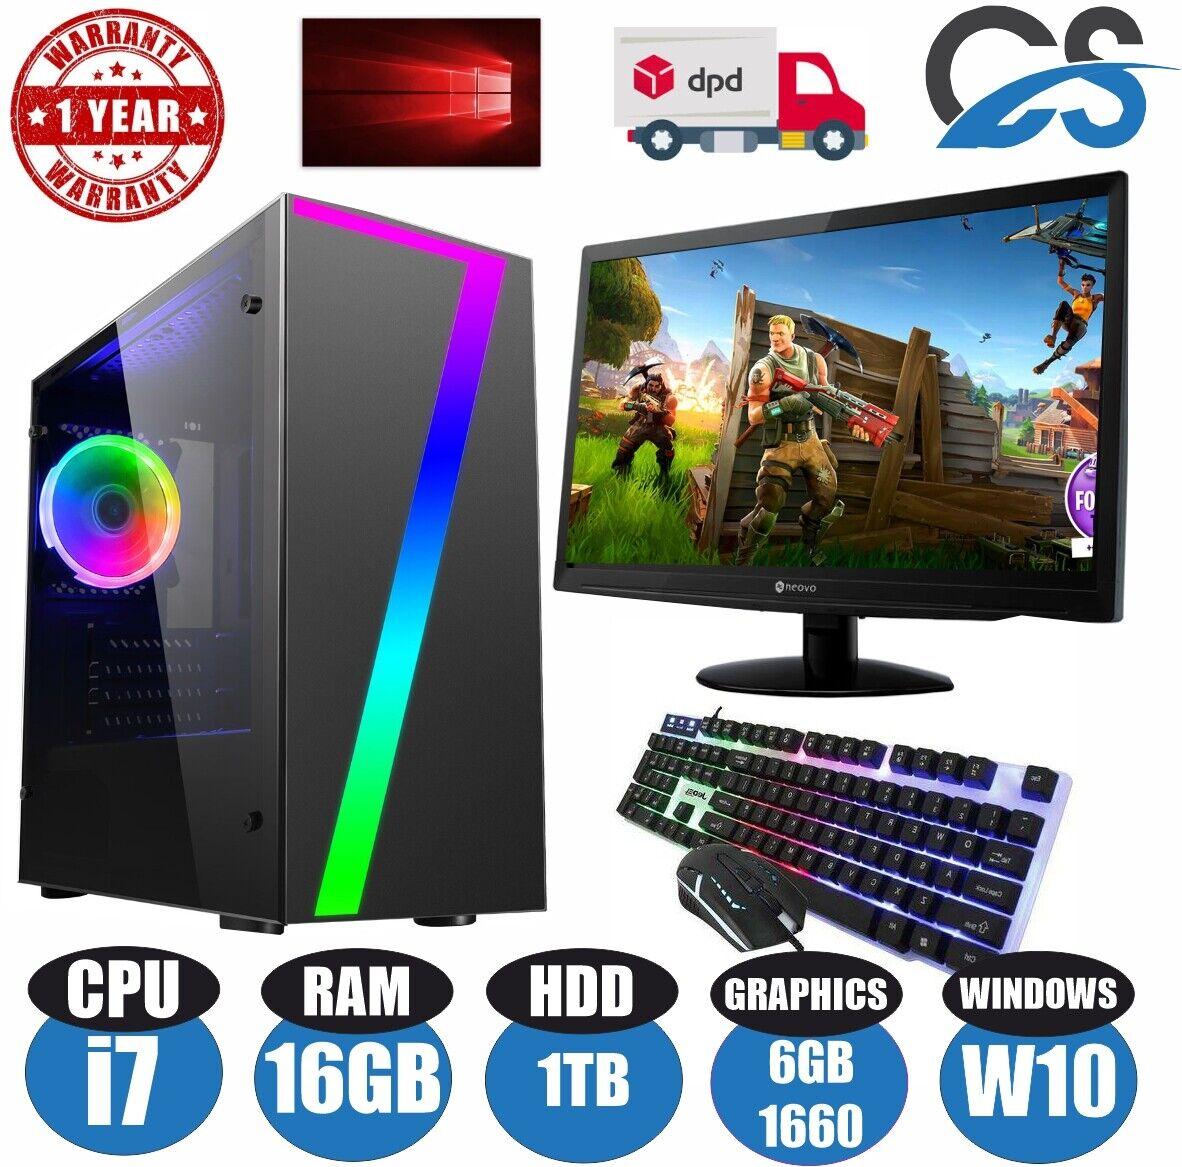 Computer Games - Fast Gaming PC Computer Bundle Intel Quad Core i7 16GB 1TB 6GB GTX1660 Windows10